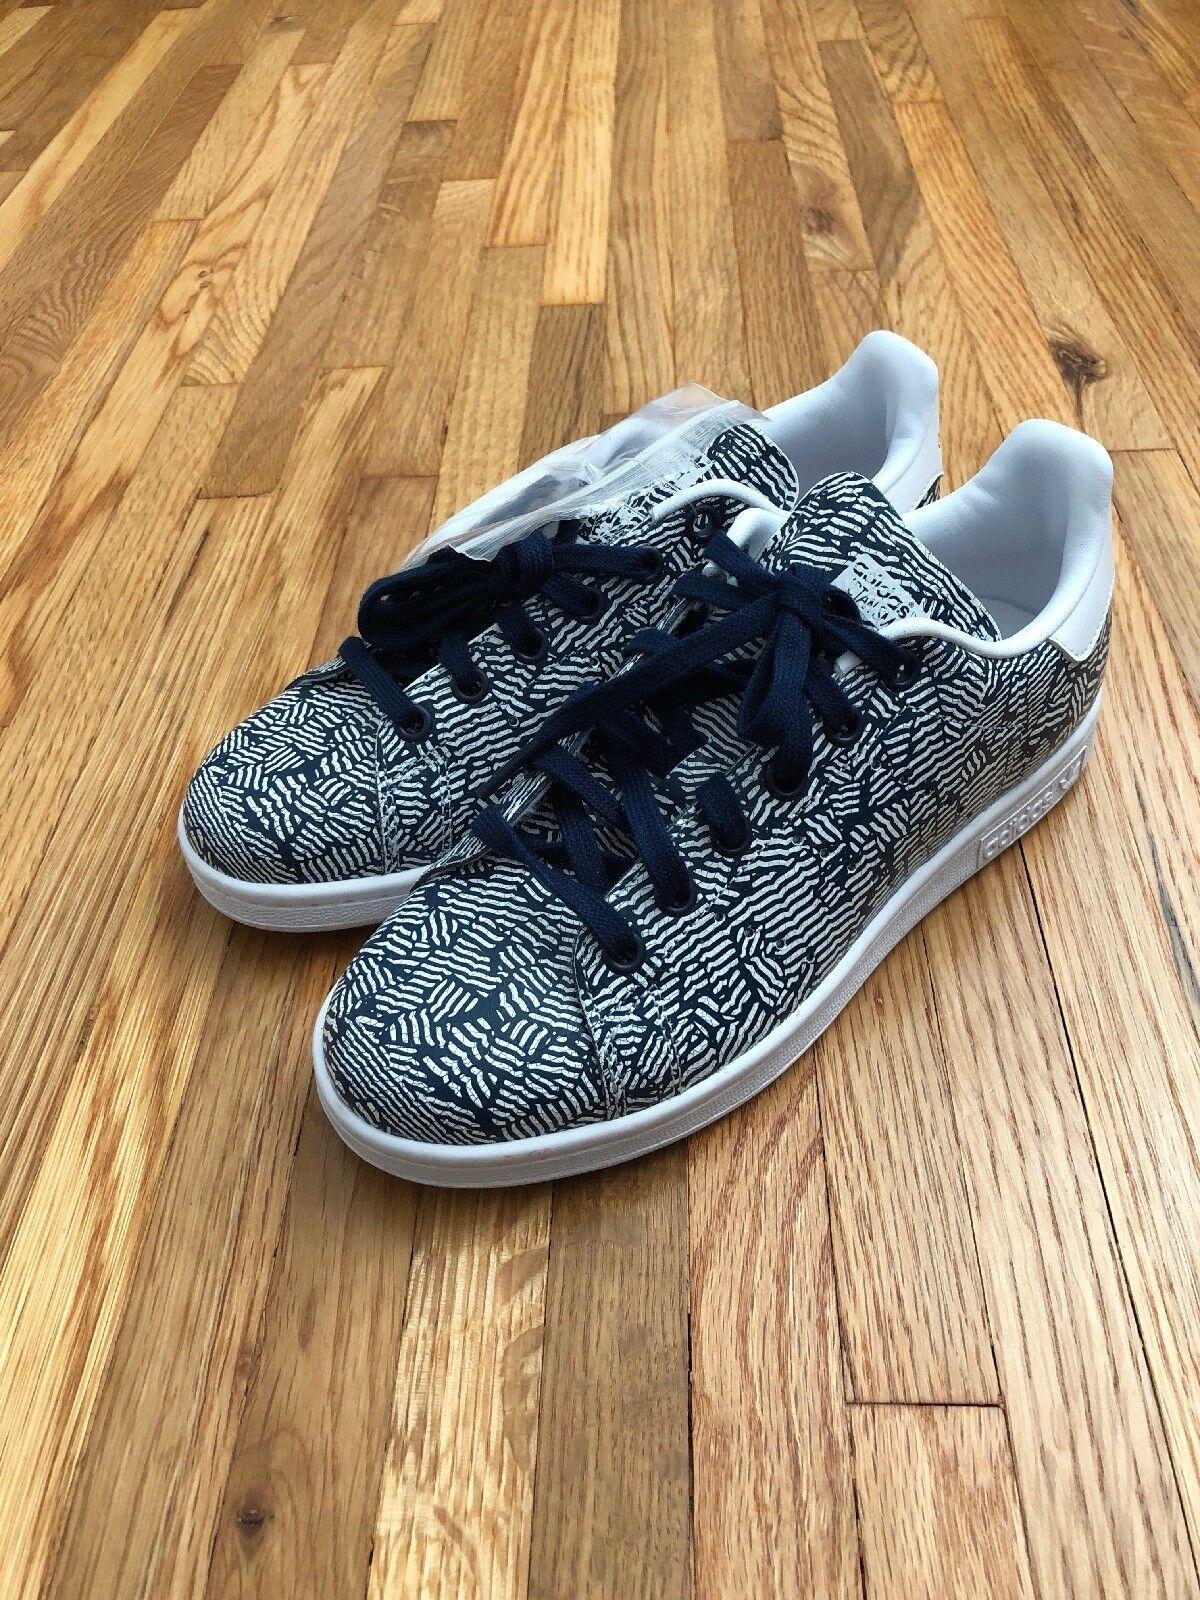 New Adidas Rare Stan Stan Stan Smith Women's shoes Zebra Print White Navy Size 6 RARE 6b25c8